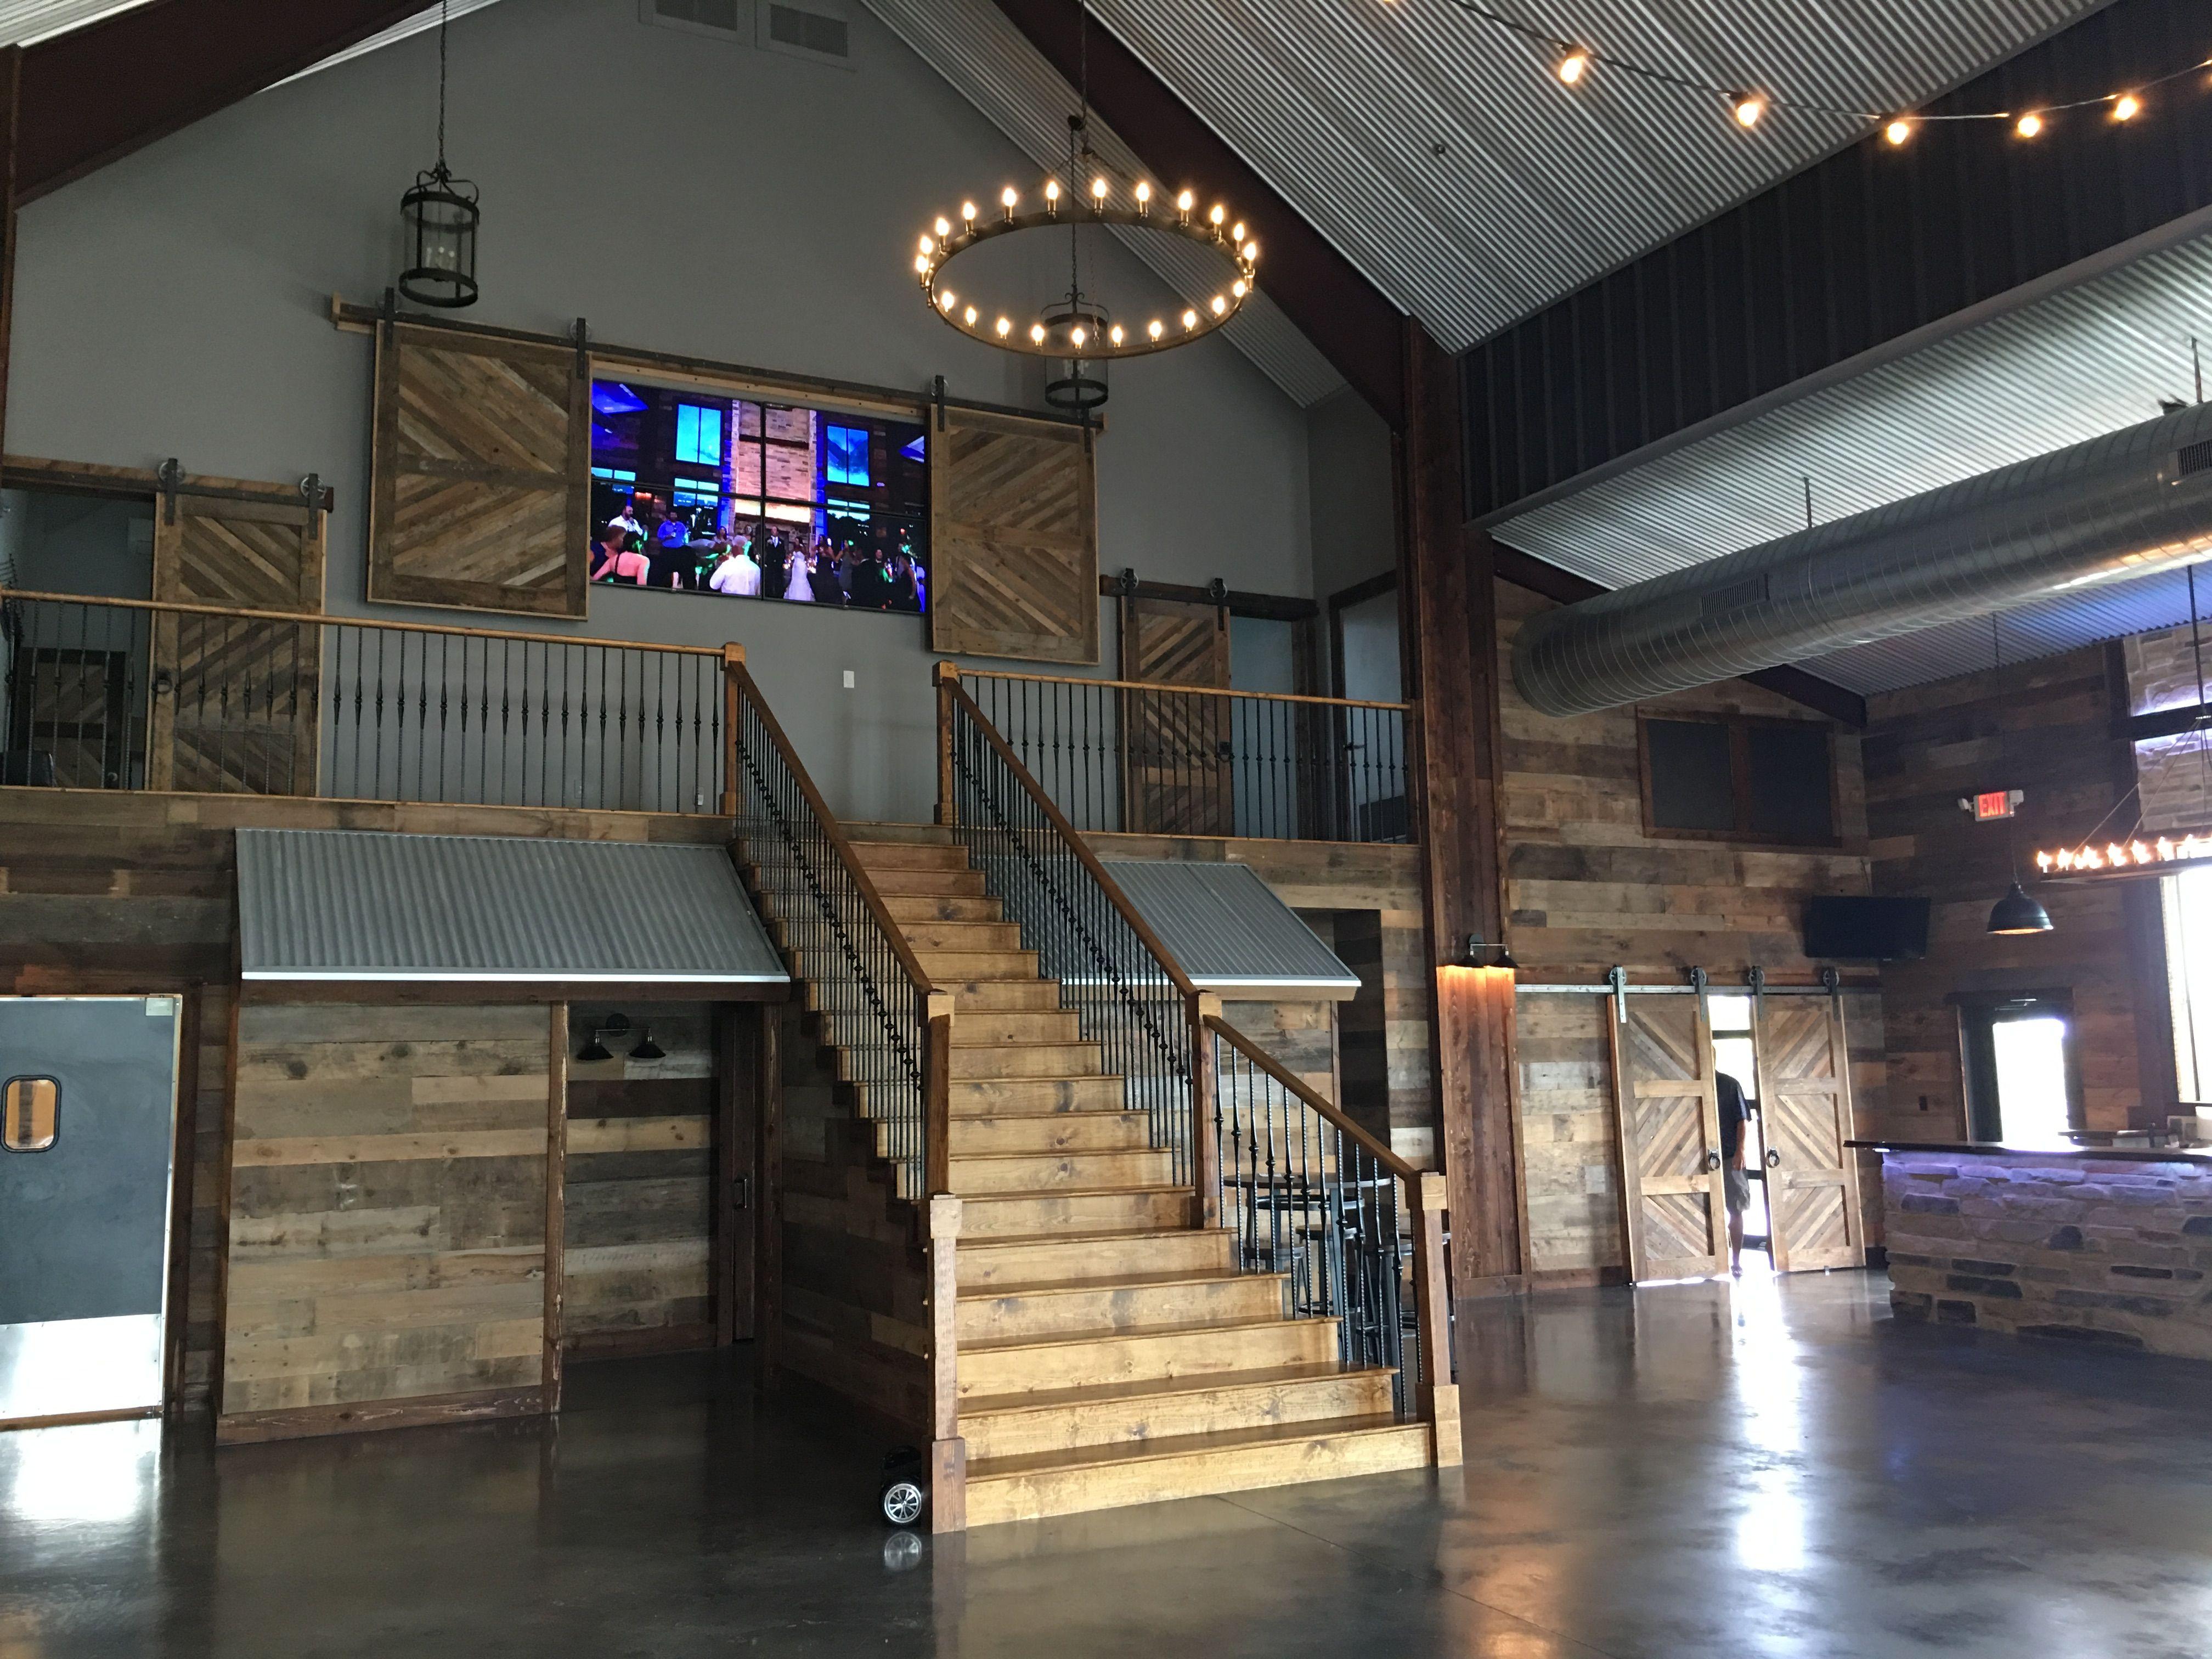 outdoor wedding venues dfw texas%0A Stone Crest Venue is a beautiful  new rustic venue in North Texas  DFW  venues